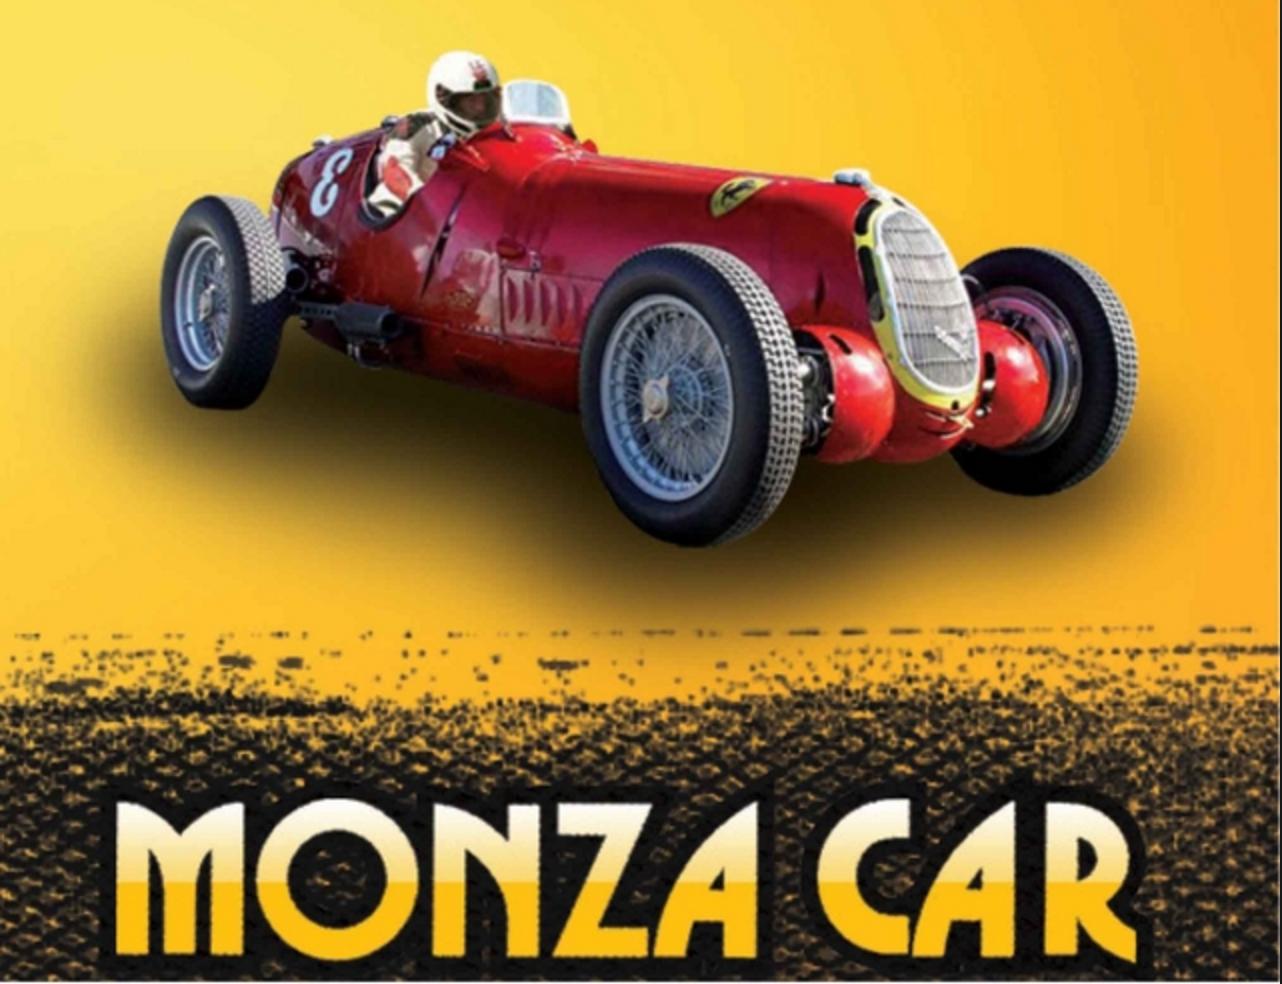 Monza Car Sherman Oaks Ca Read Consumer Reviews